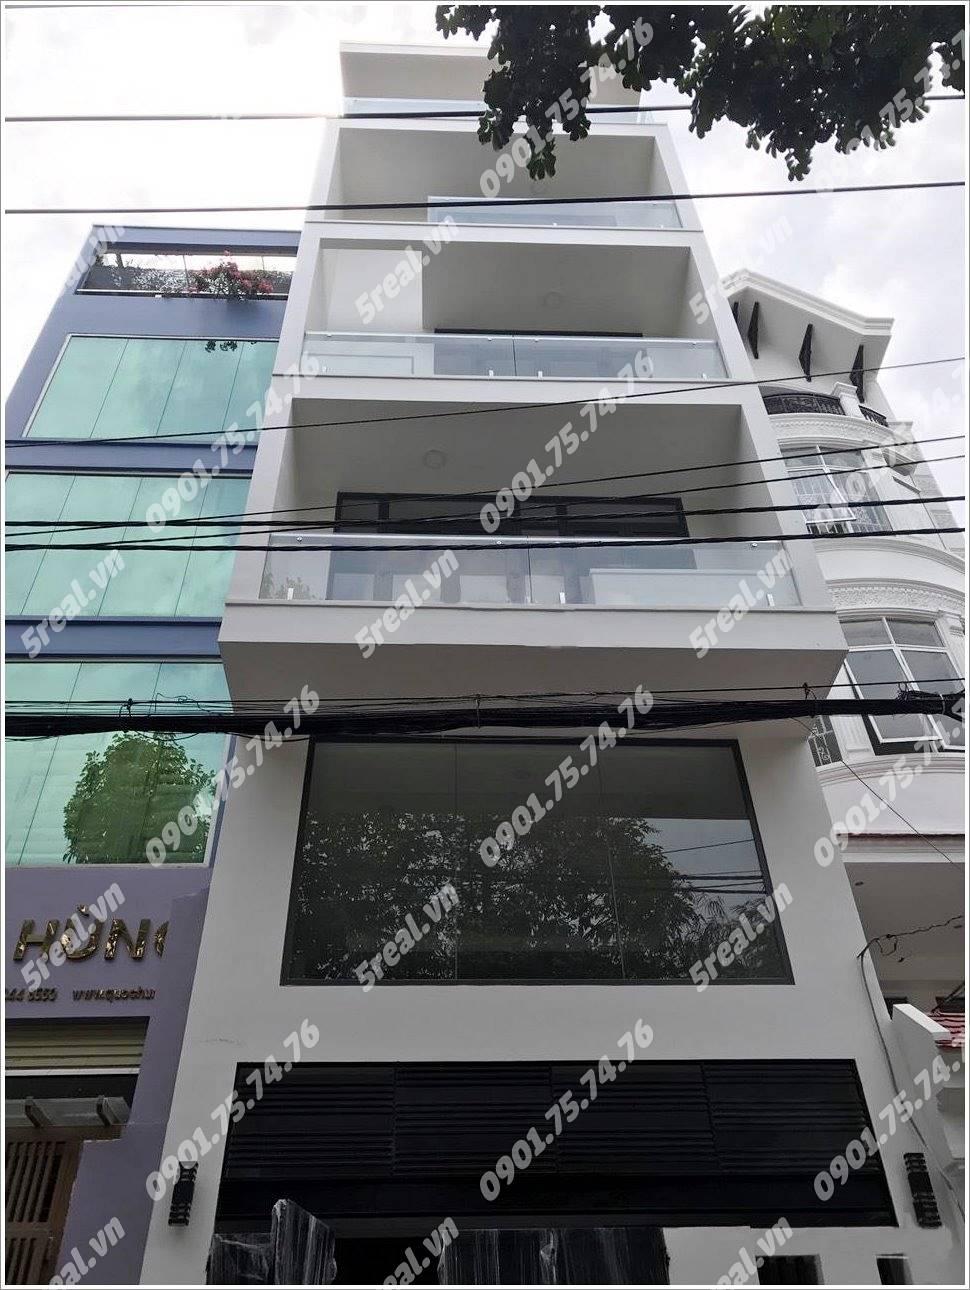 cc19-building-truong-son-quan-10-van-phong-cho-thue-5real.vn-01